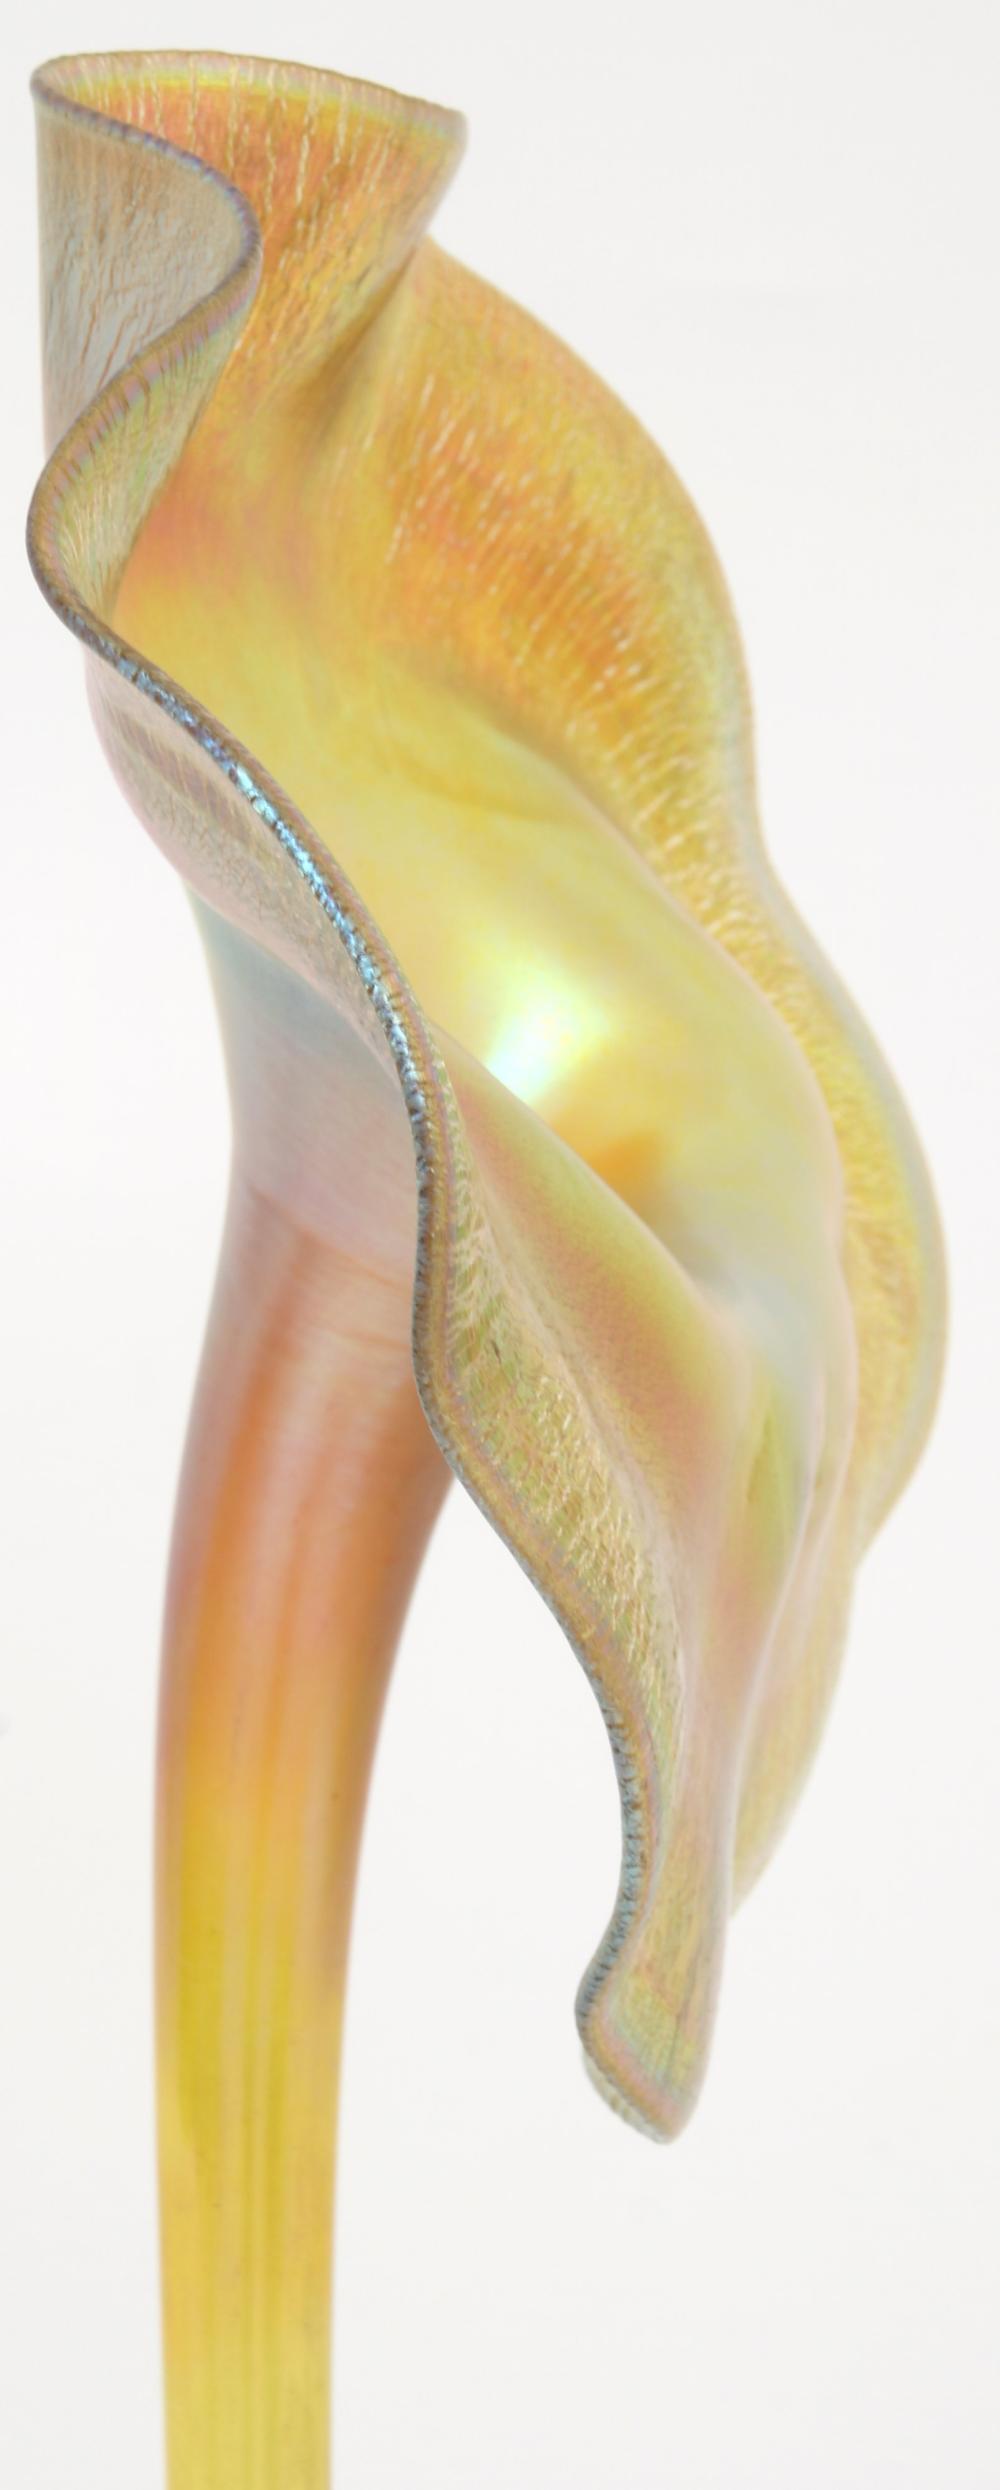 "Tiffany Studios ""Jack-in-the-Pulpit"" Vase"